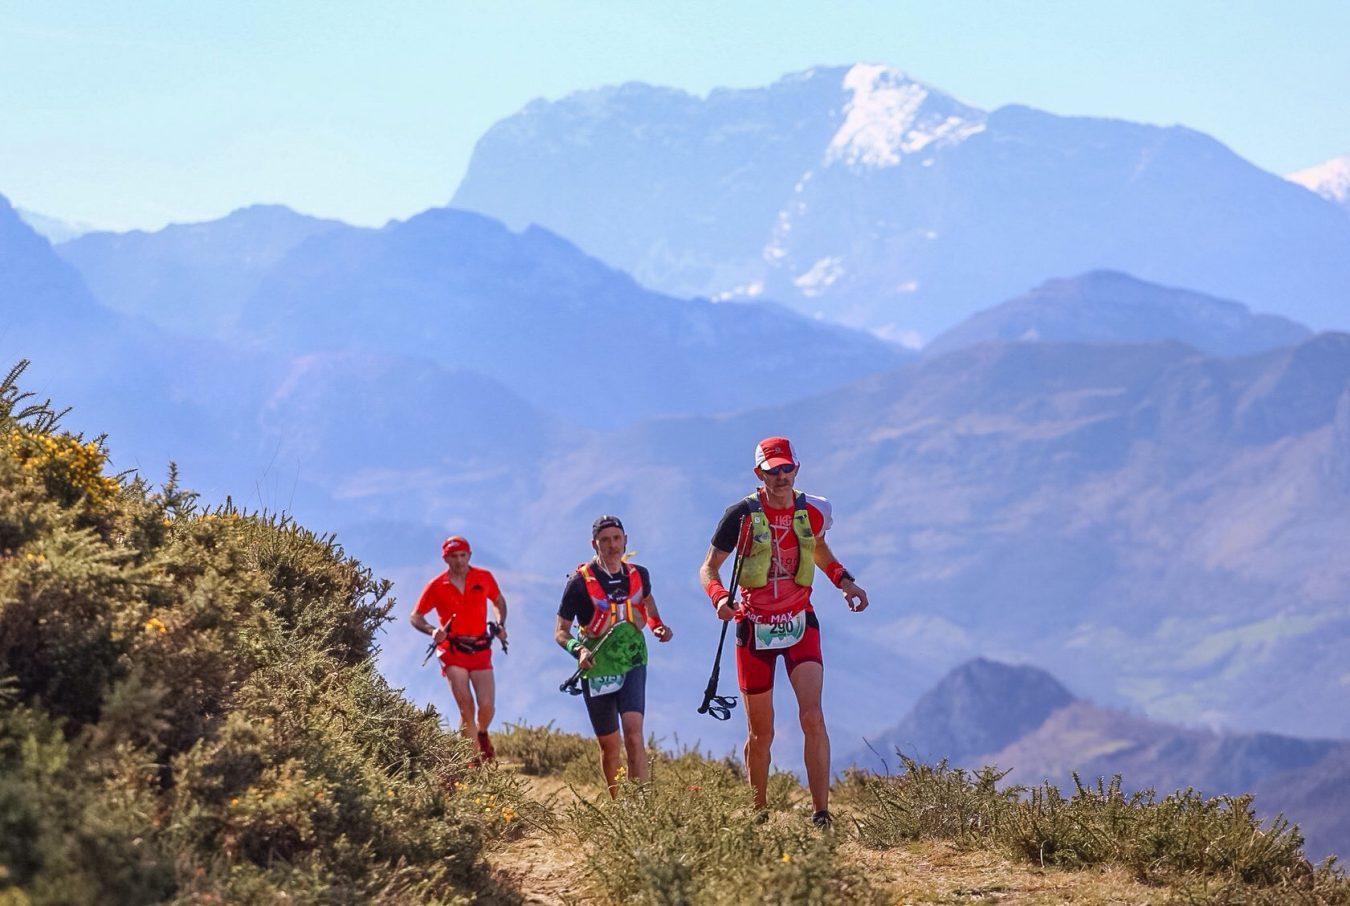 La Kangas Mountain reunirá a 1.060 atletas en la salida del próximo sábado